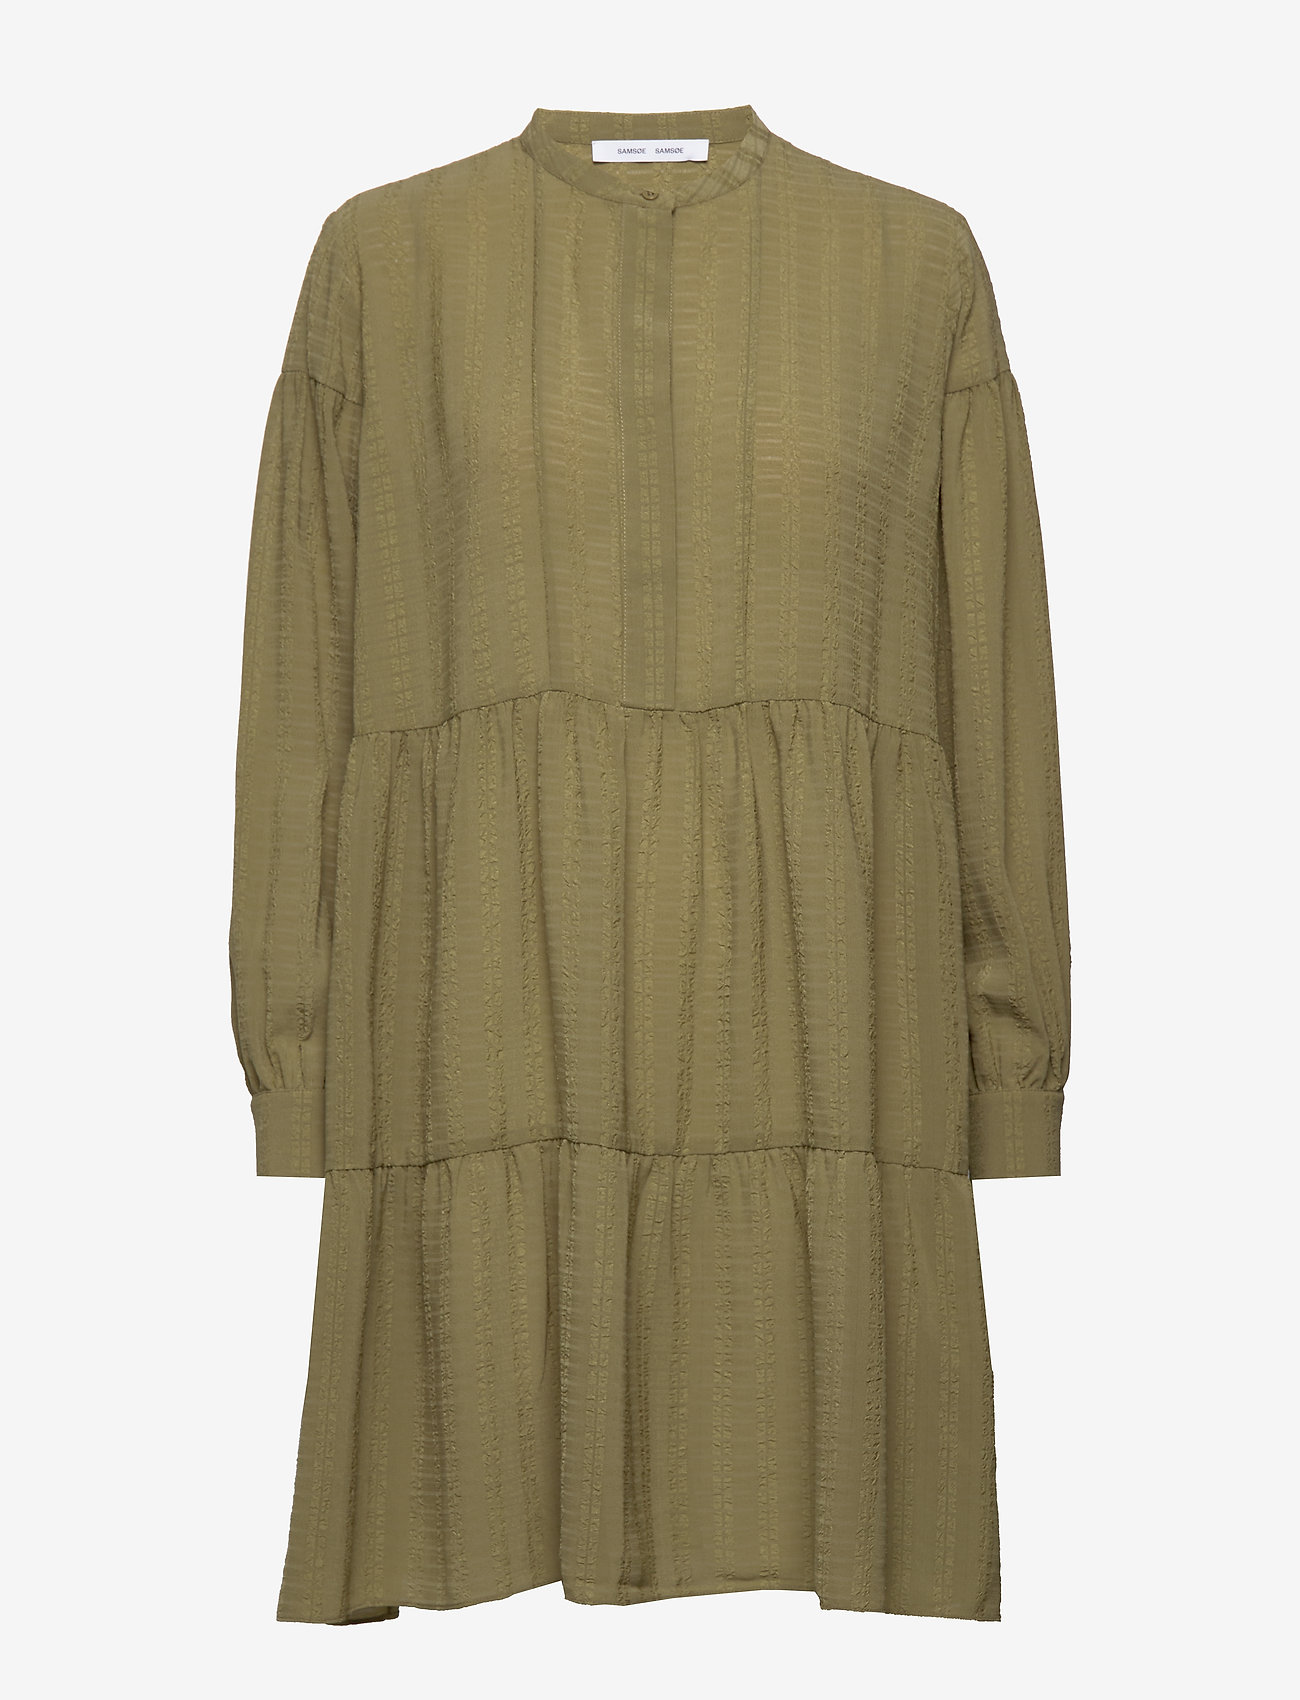 Samsøe Samsøe - Margo shirt dress 12697 - korte kjoler - air khaki - 0